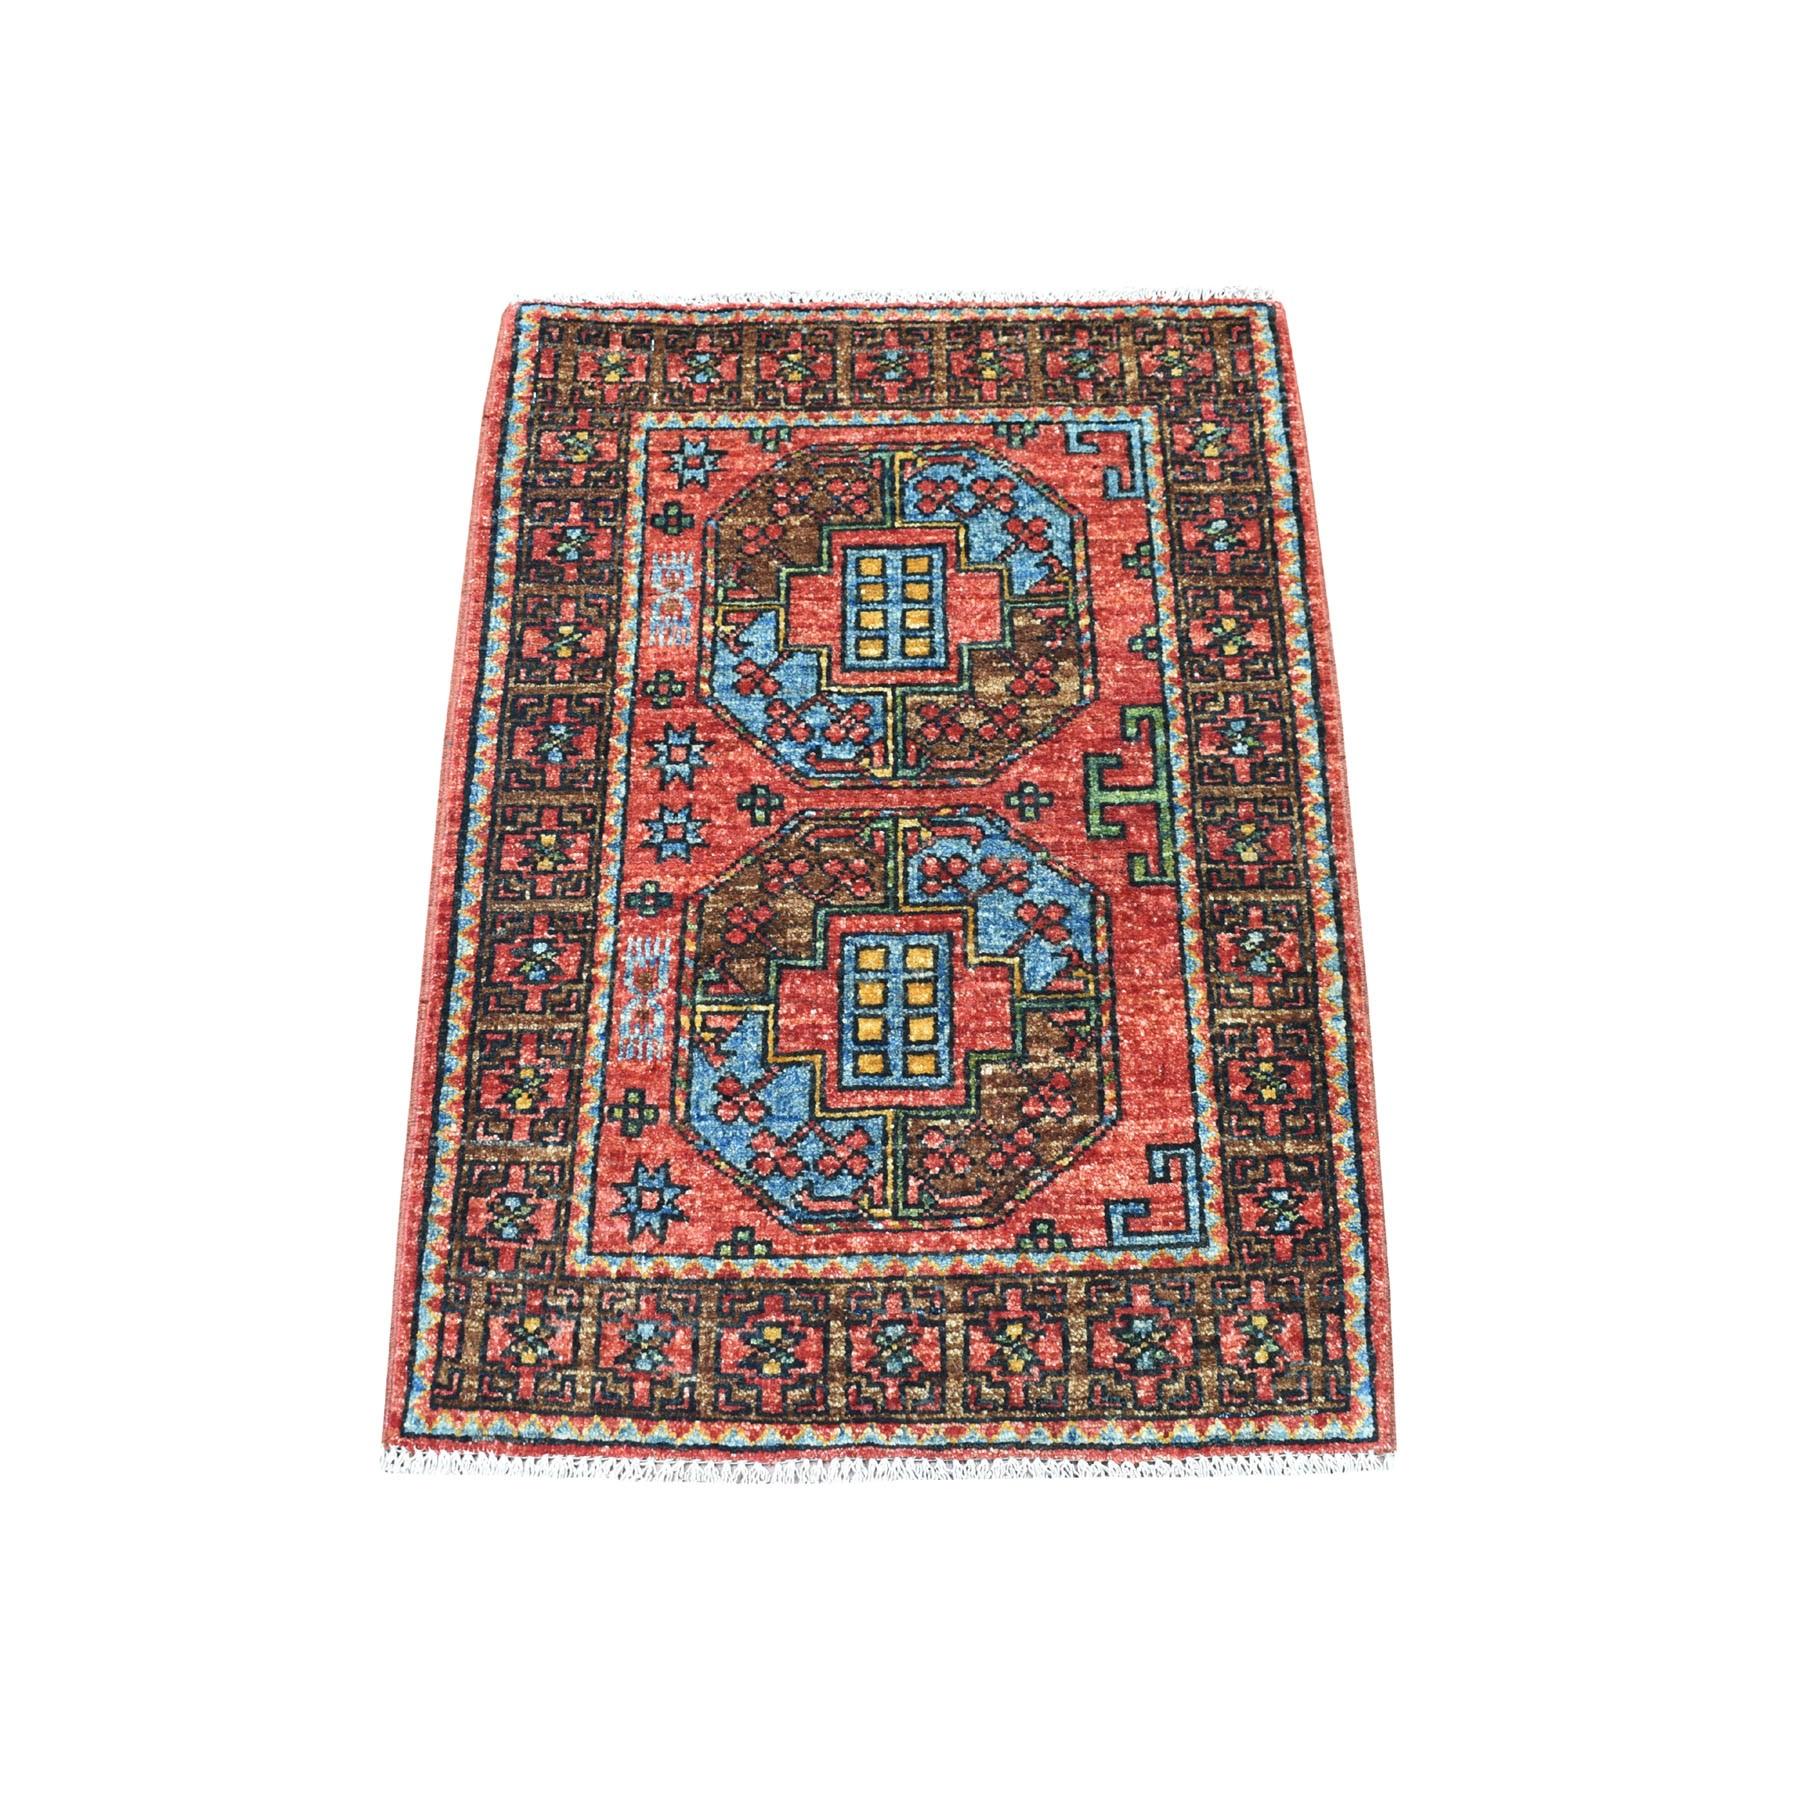 "2'1""X3' Red Elephant Feet Design Hand Knotted Turkoman Afghan Ersari Pure Wool Oriental Rug moaecbbb"